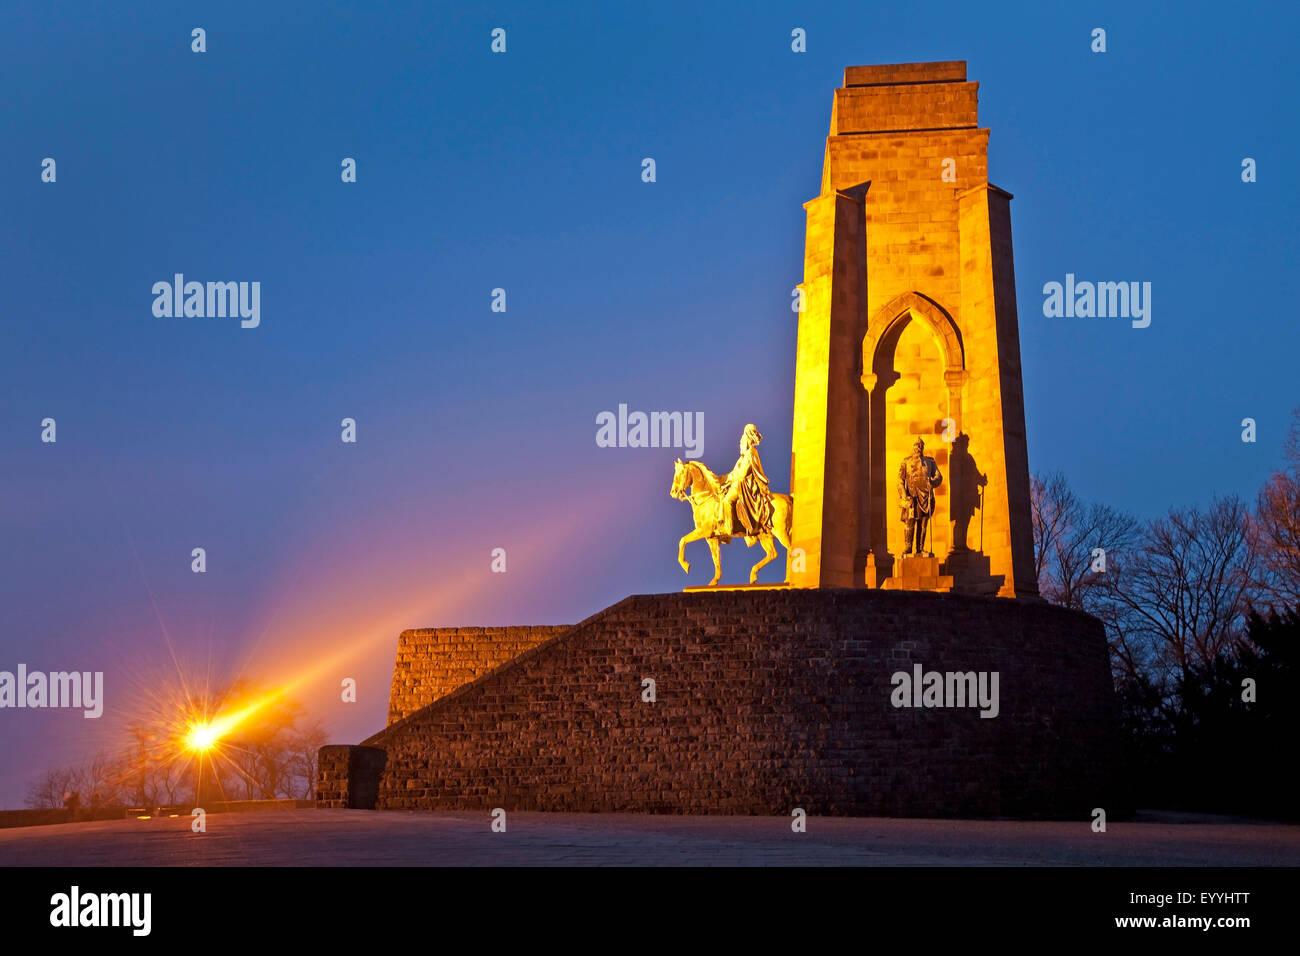 Emperor William monument in Dortmund-Hohensyburg, Germany, North Rhine-Westphalia, Ruhr Area, Dortmund - Stock Image